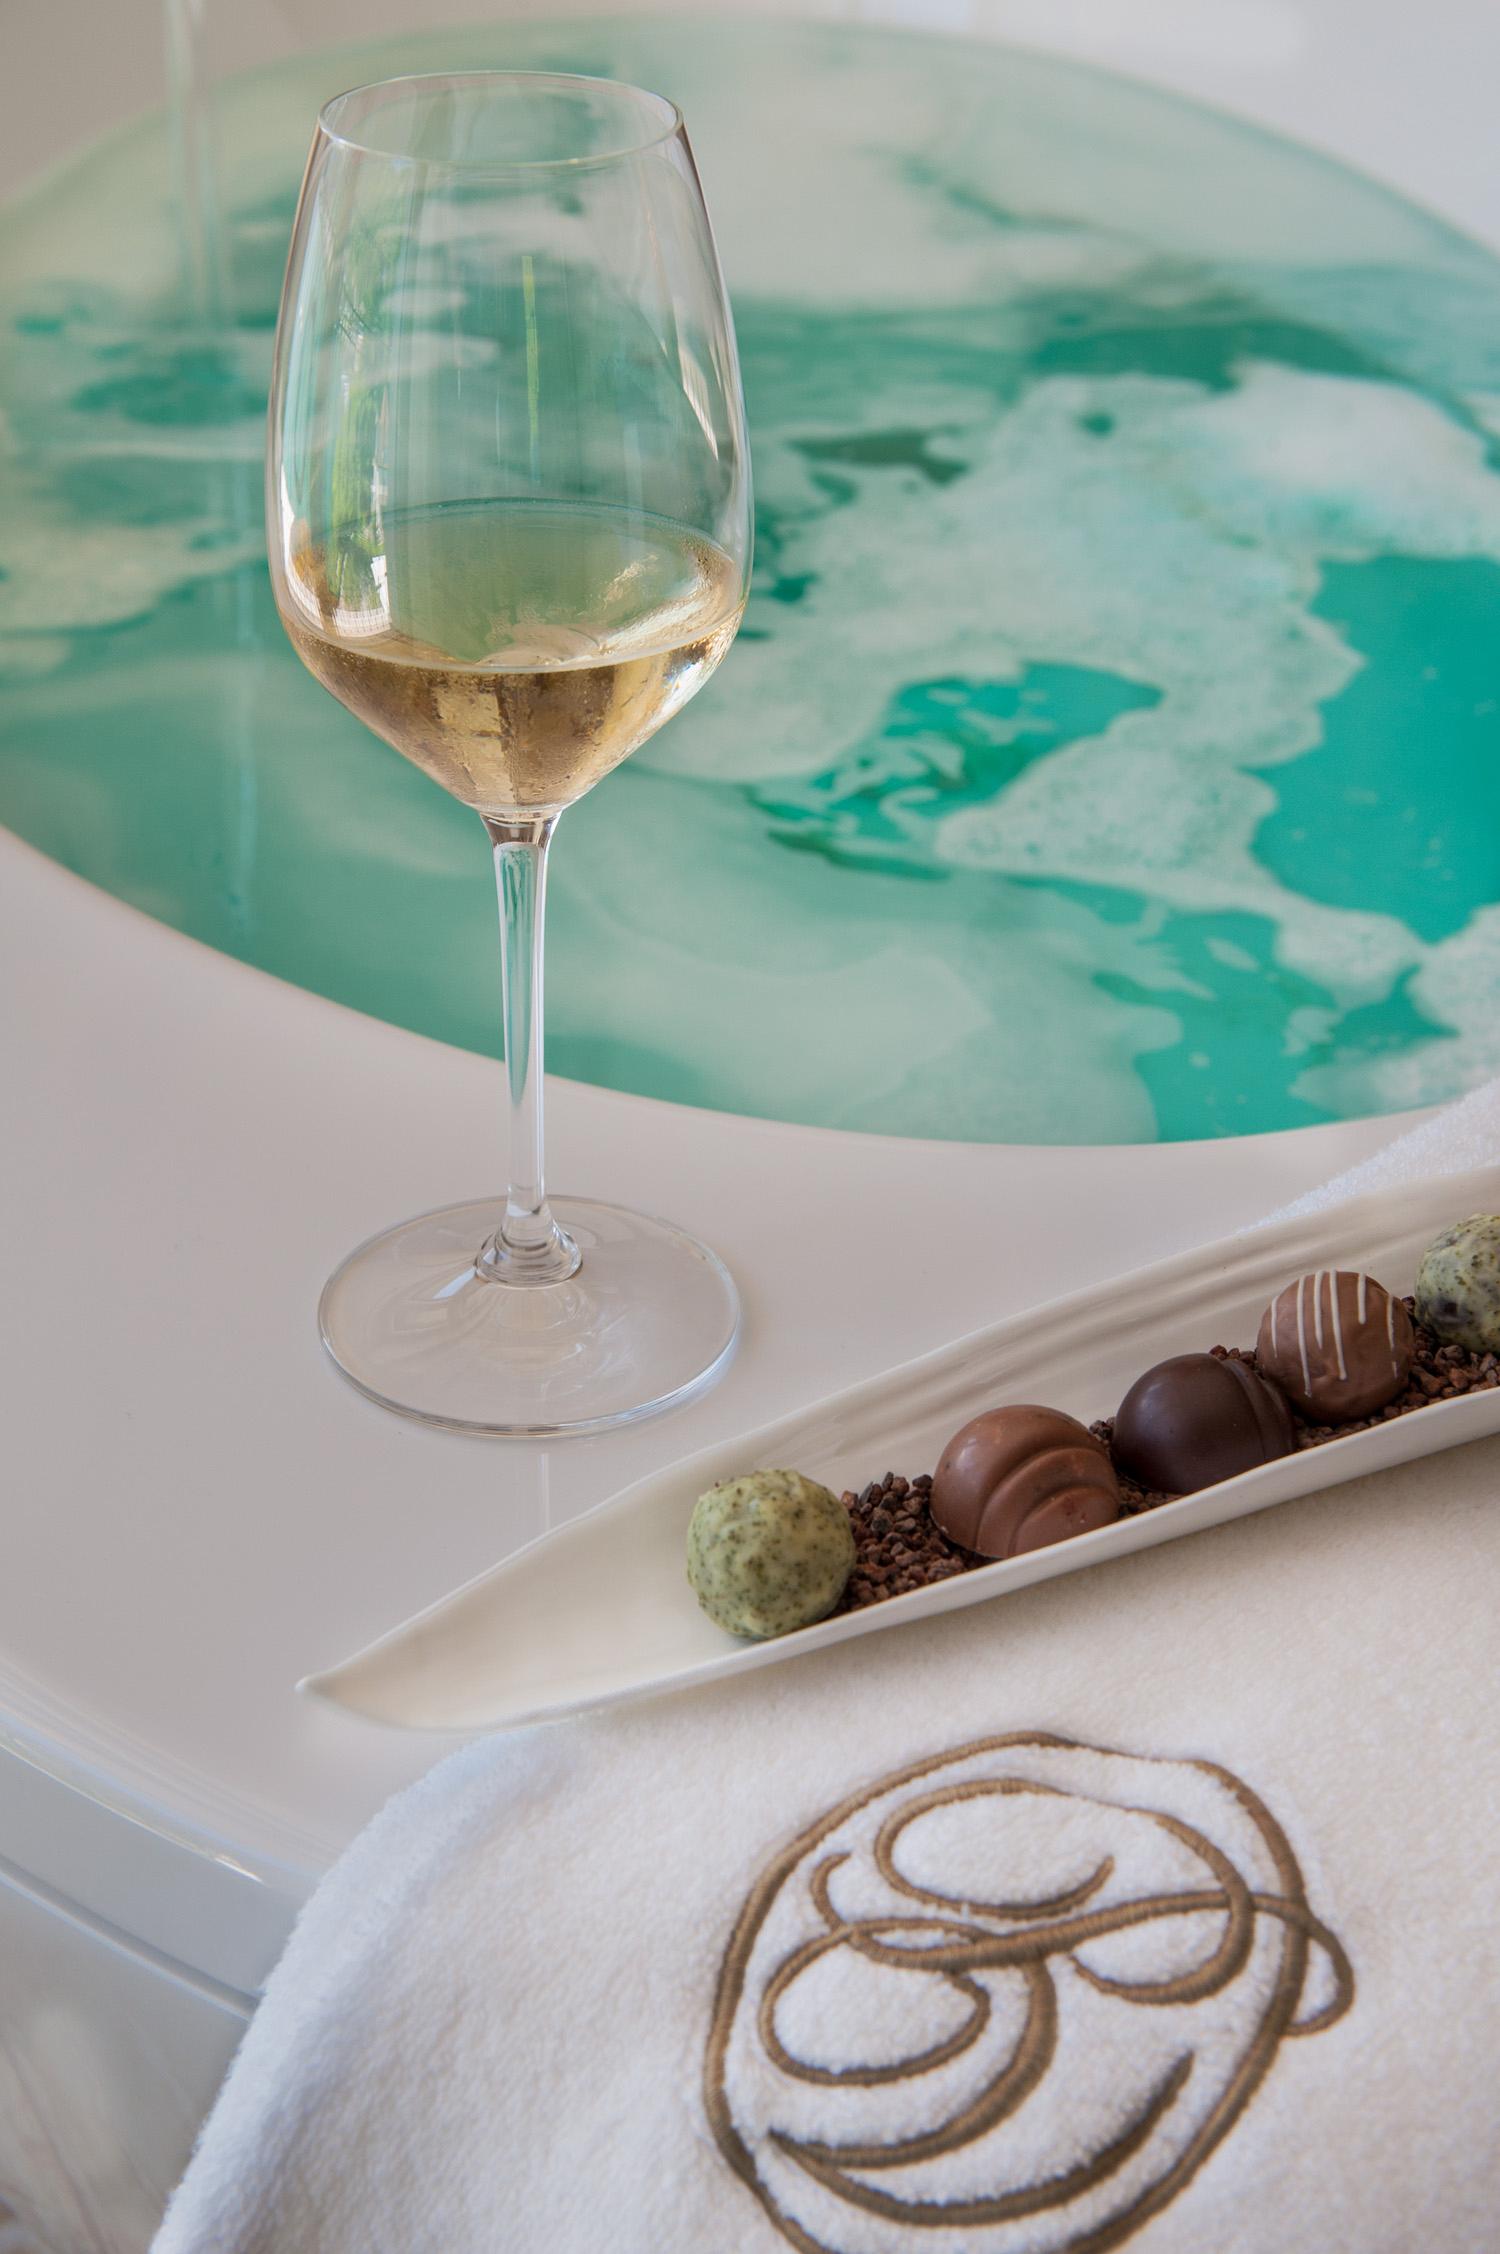 Nominee Bathtime - Location -Park Hotel Vitznau, Switzerland